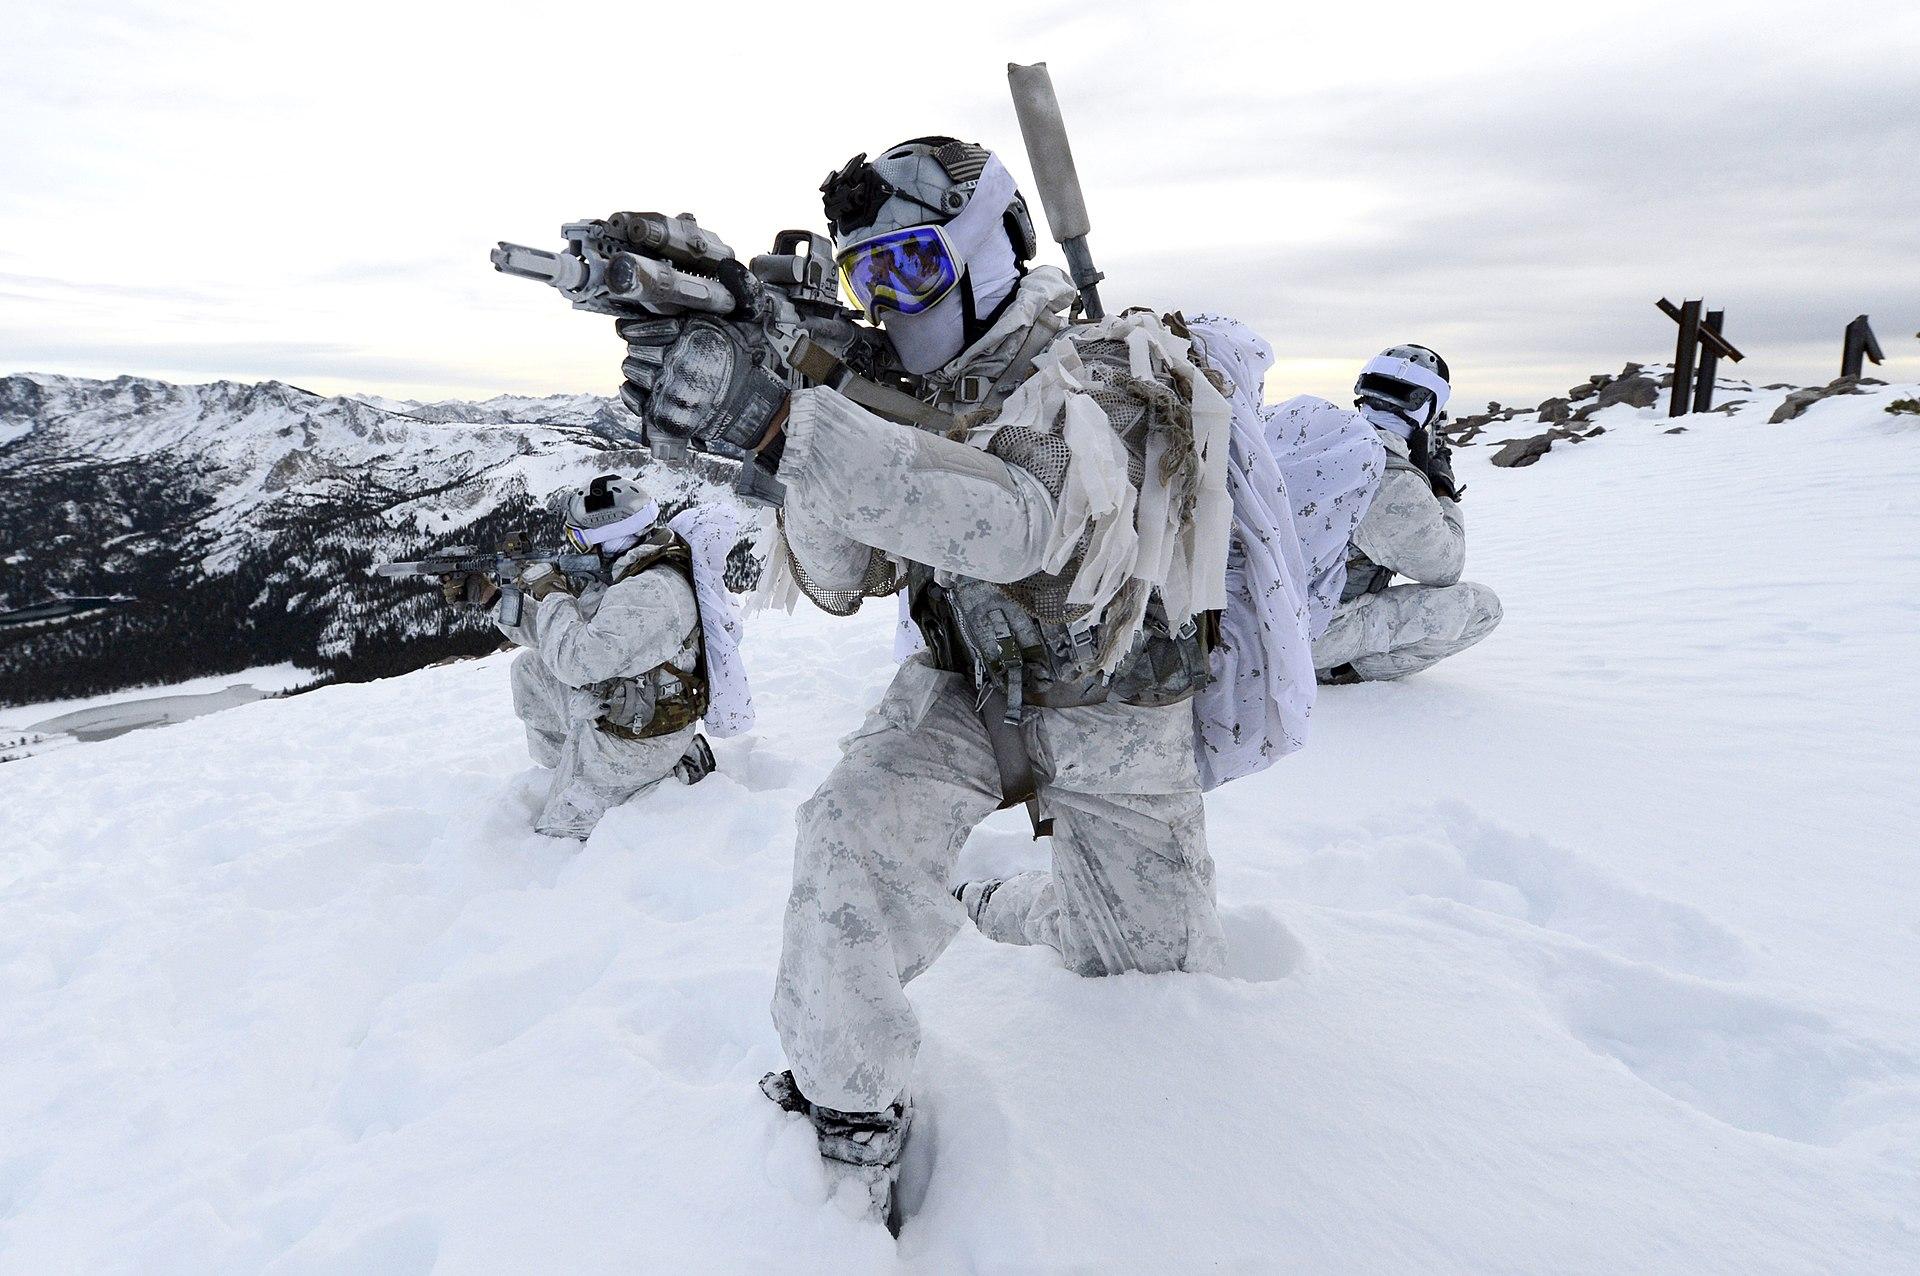 1920px-Navy_Seals_Winter_warfare_at_Mammoth_Mountain,_California,_in_December_2014